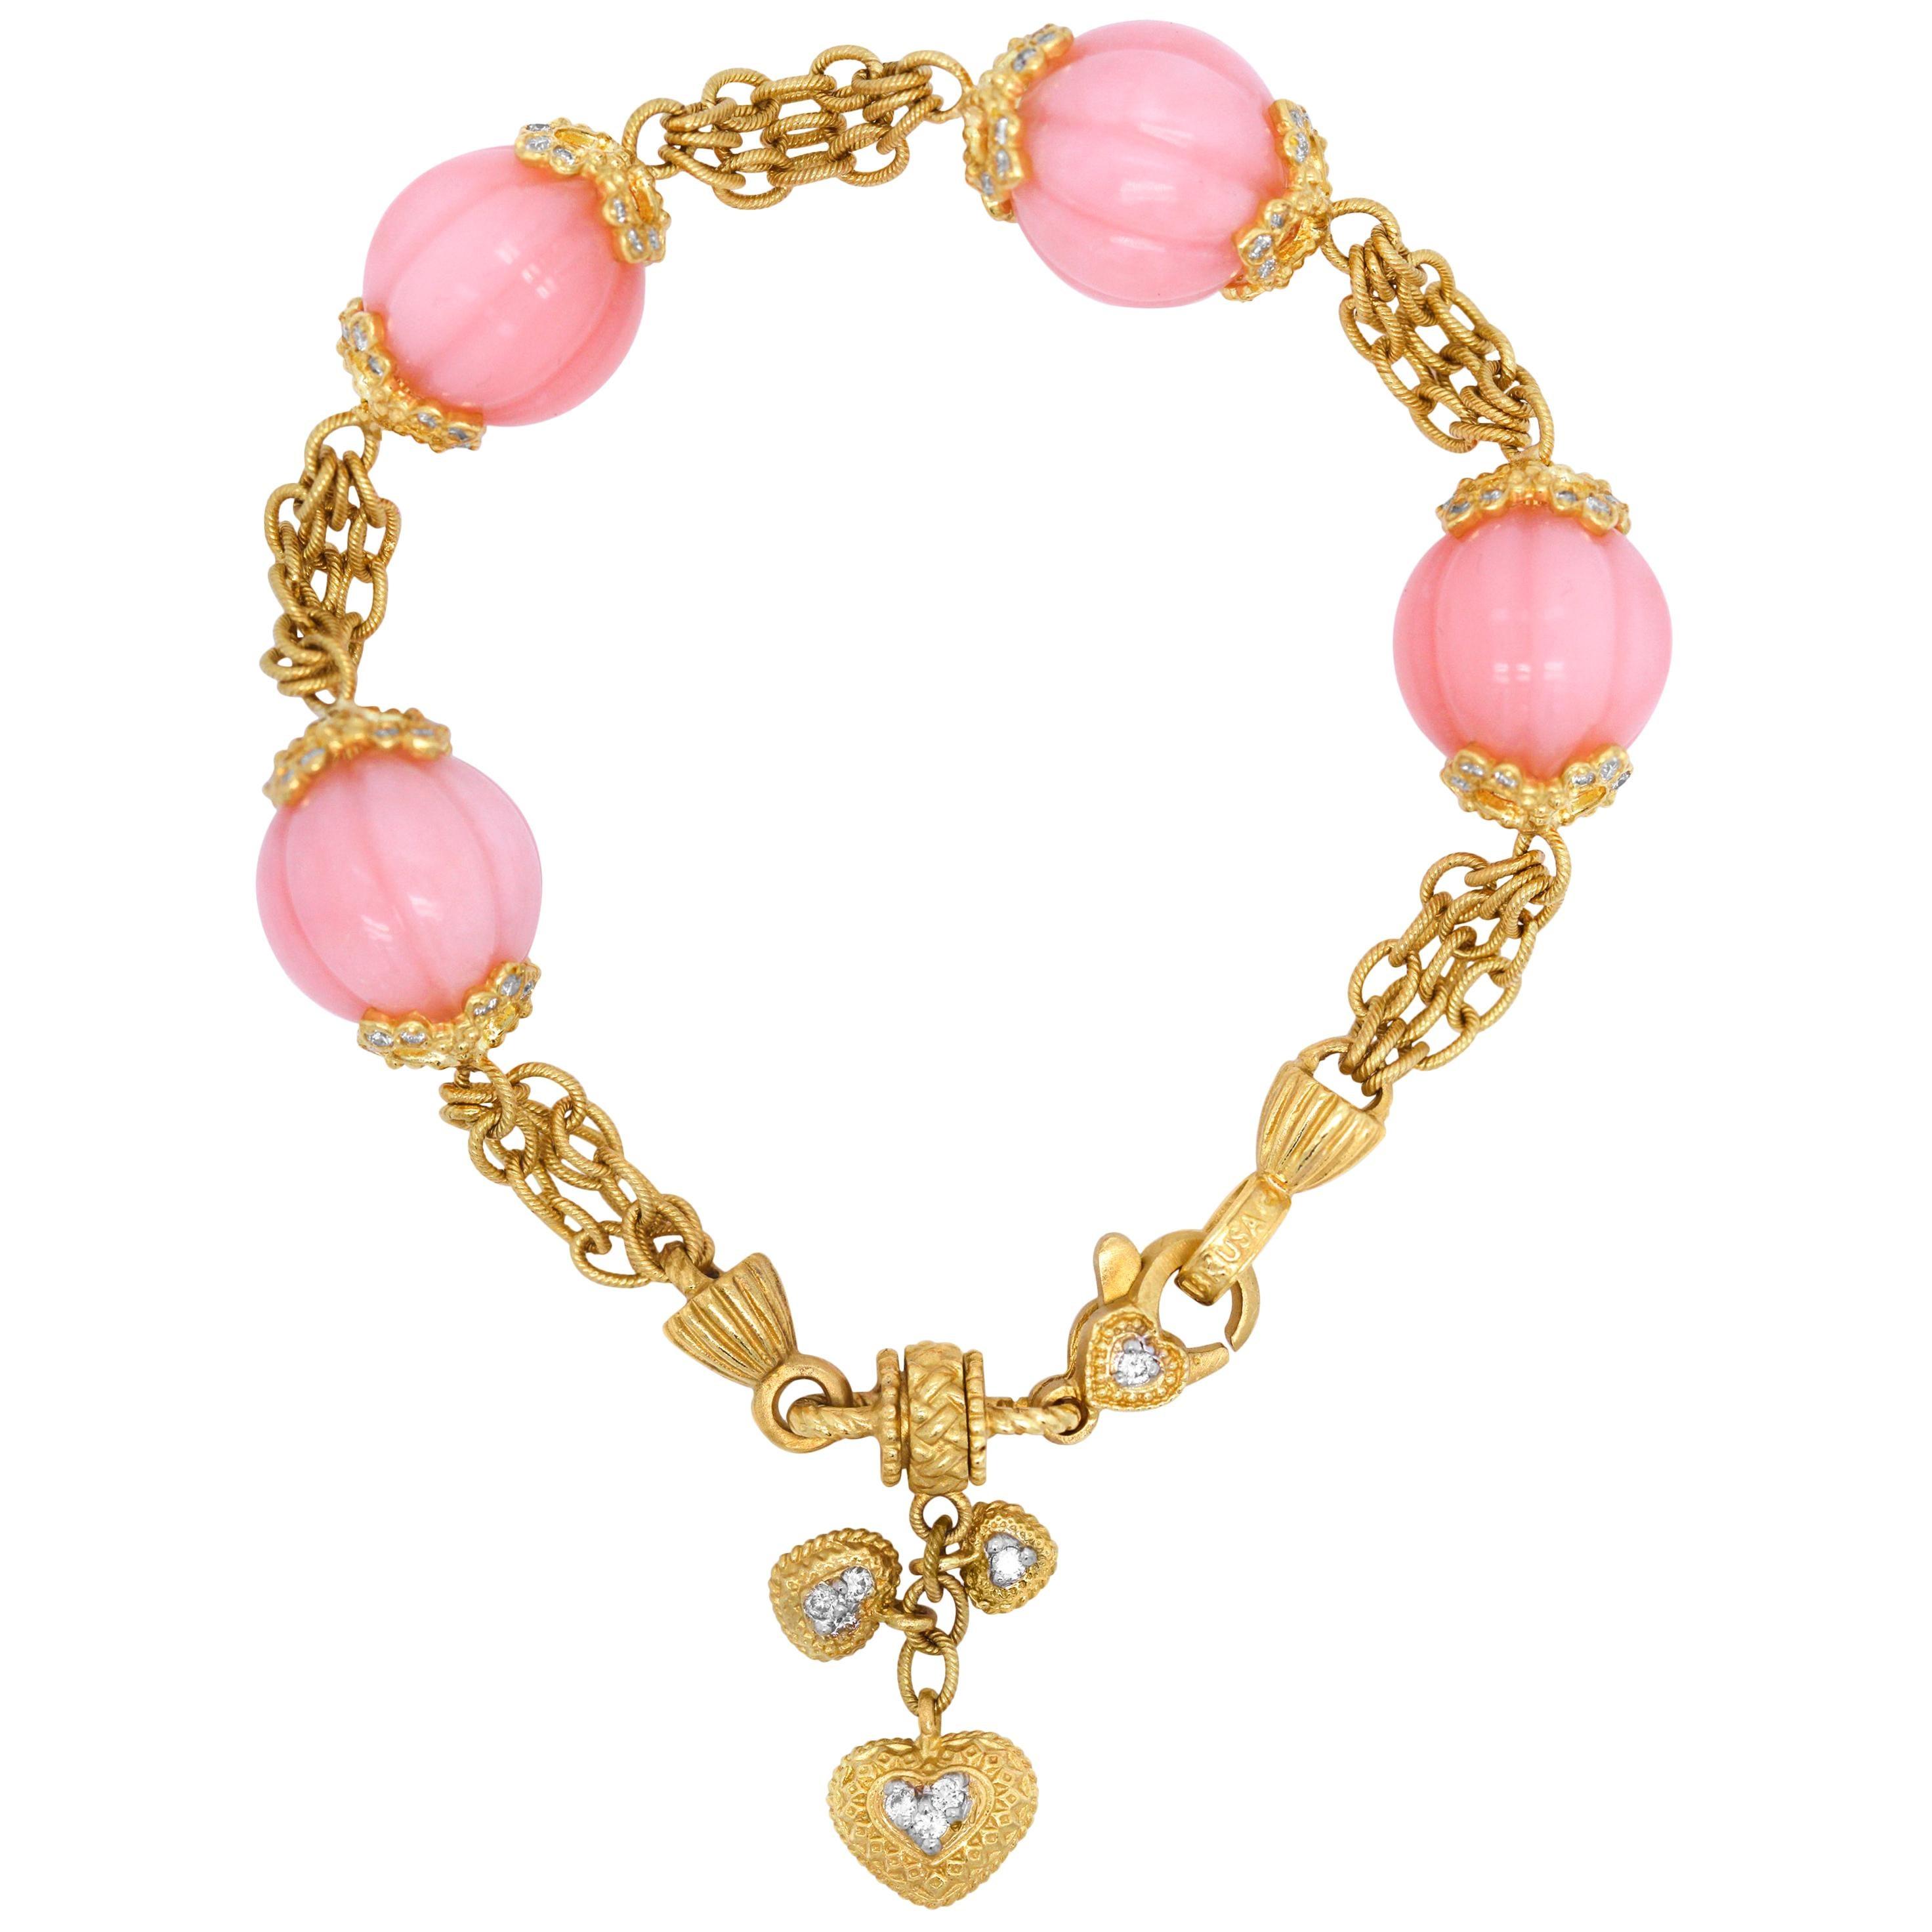 Stambolian Pink Peruvian Opal 18K Yellow Gold Diamond Charm Bracelet with Hearts